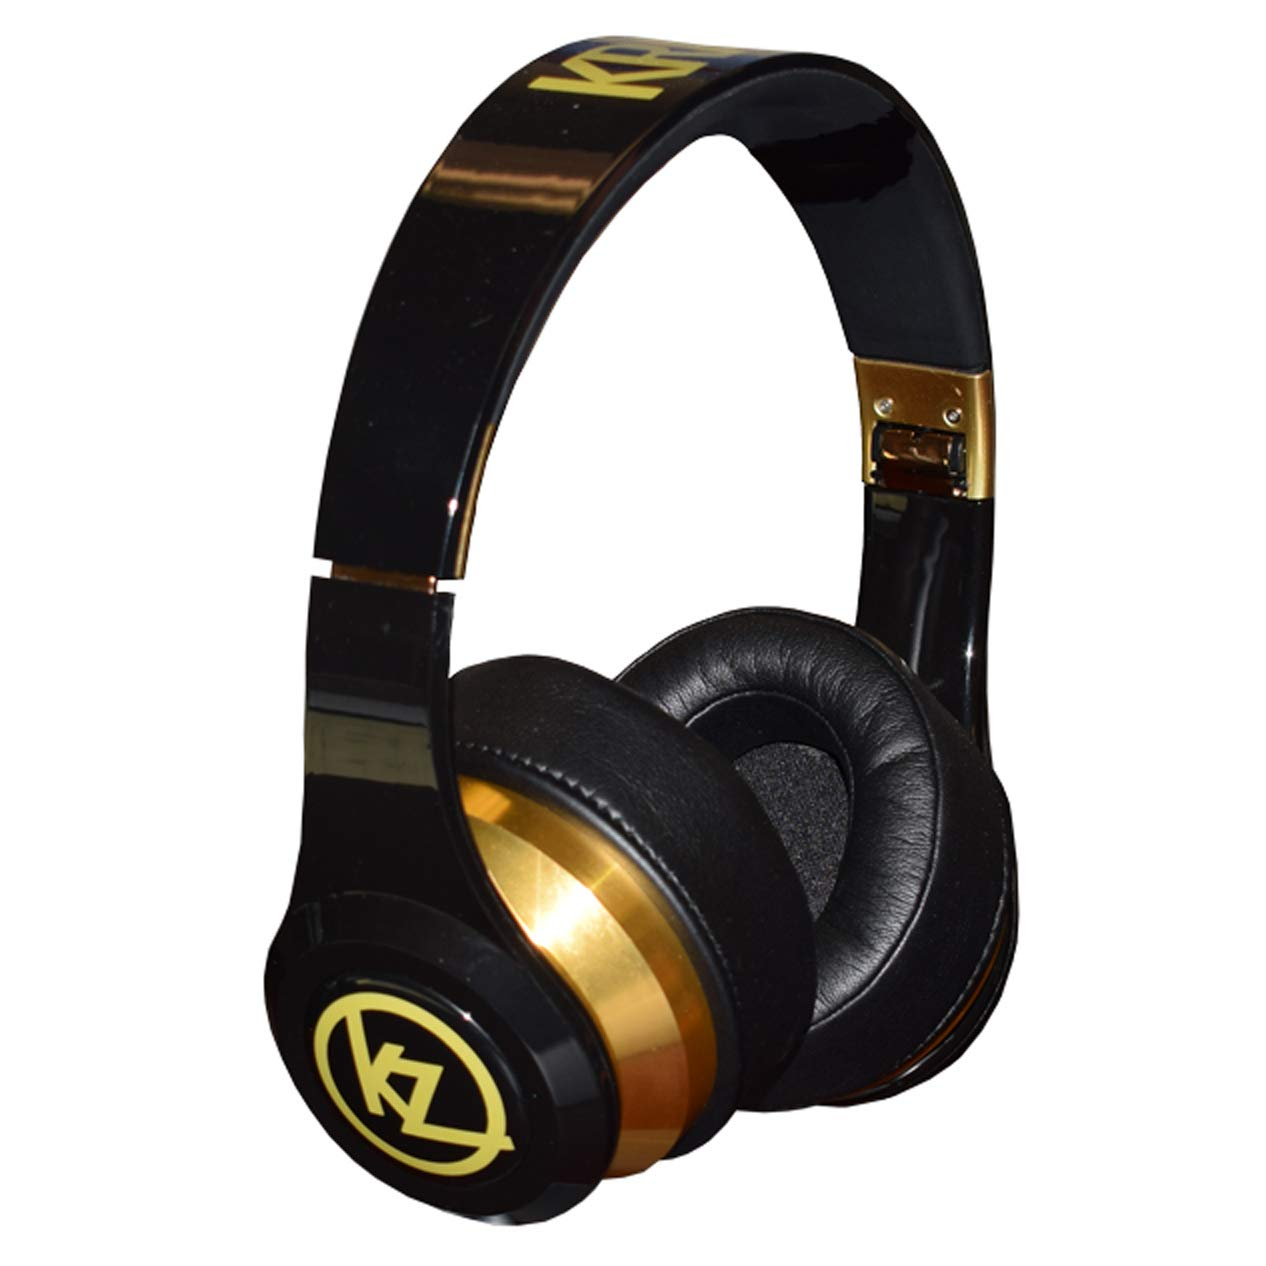 Krankz Maxx Wireless Active Noise Cancelling Over-Ear Headphones - Black & Gold